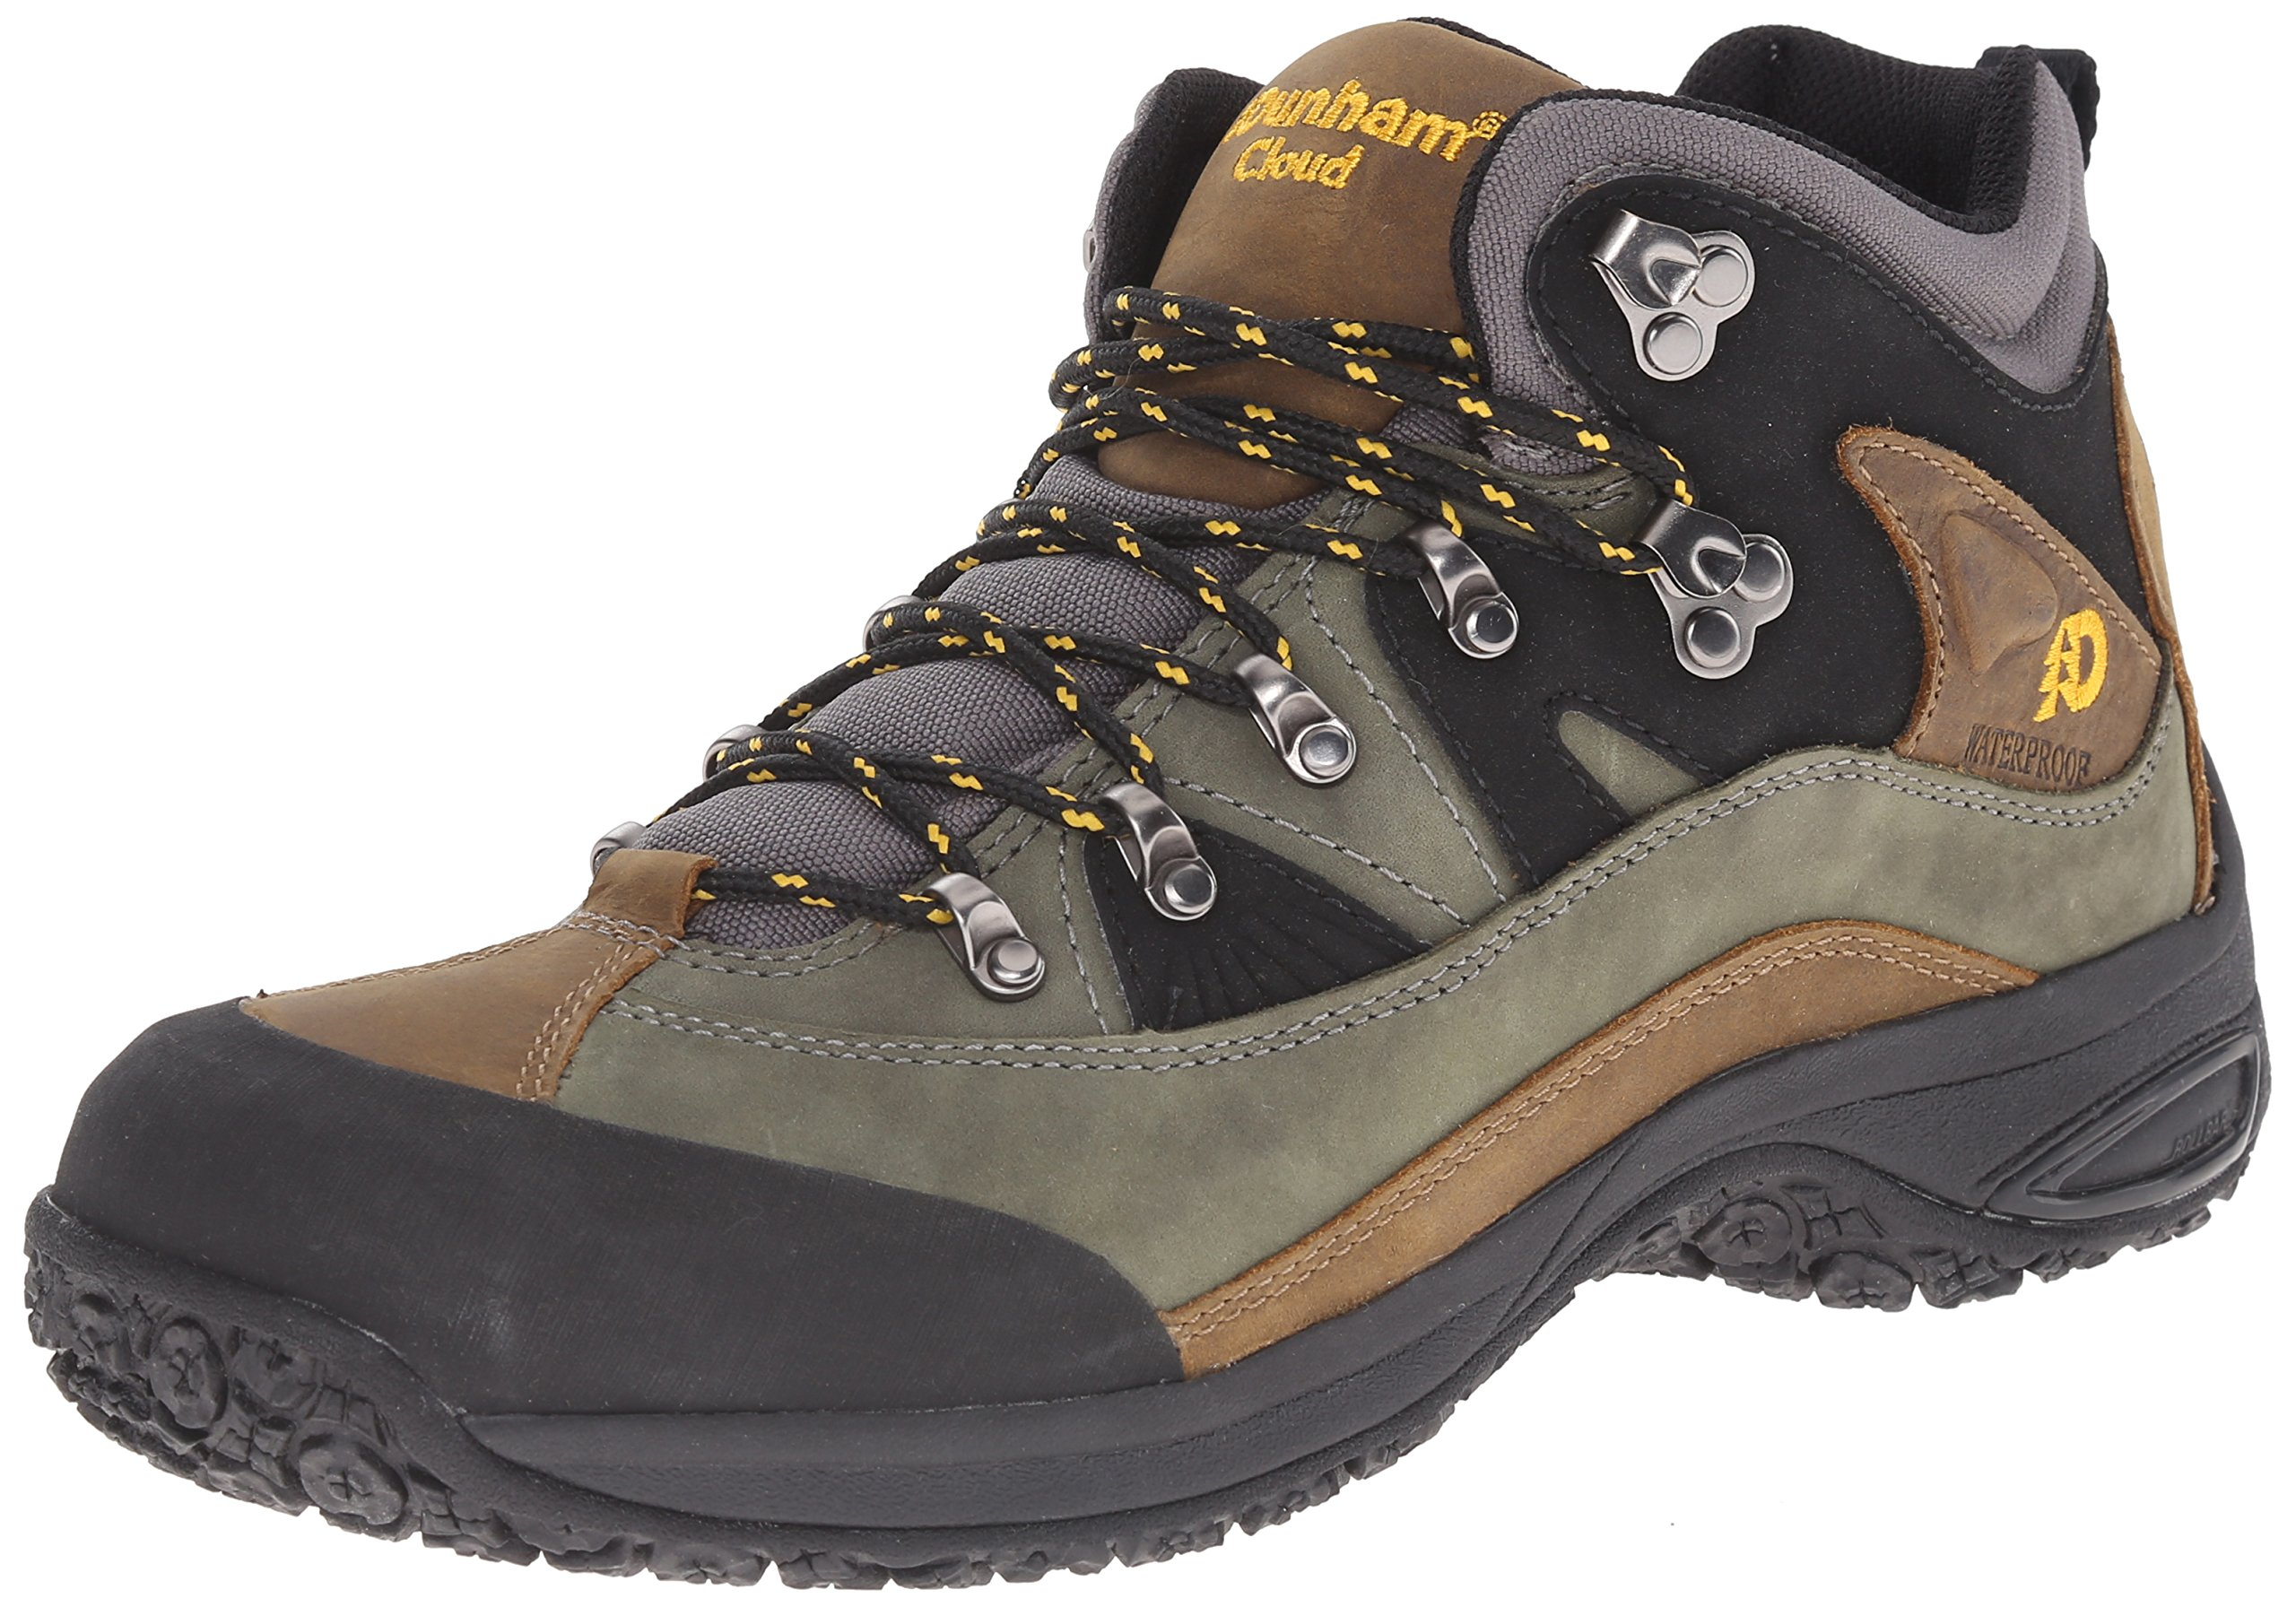 Dunham Men's Cloud Mid-Cut Waterproof Boot, Grey - 8.5 2E US